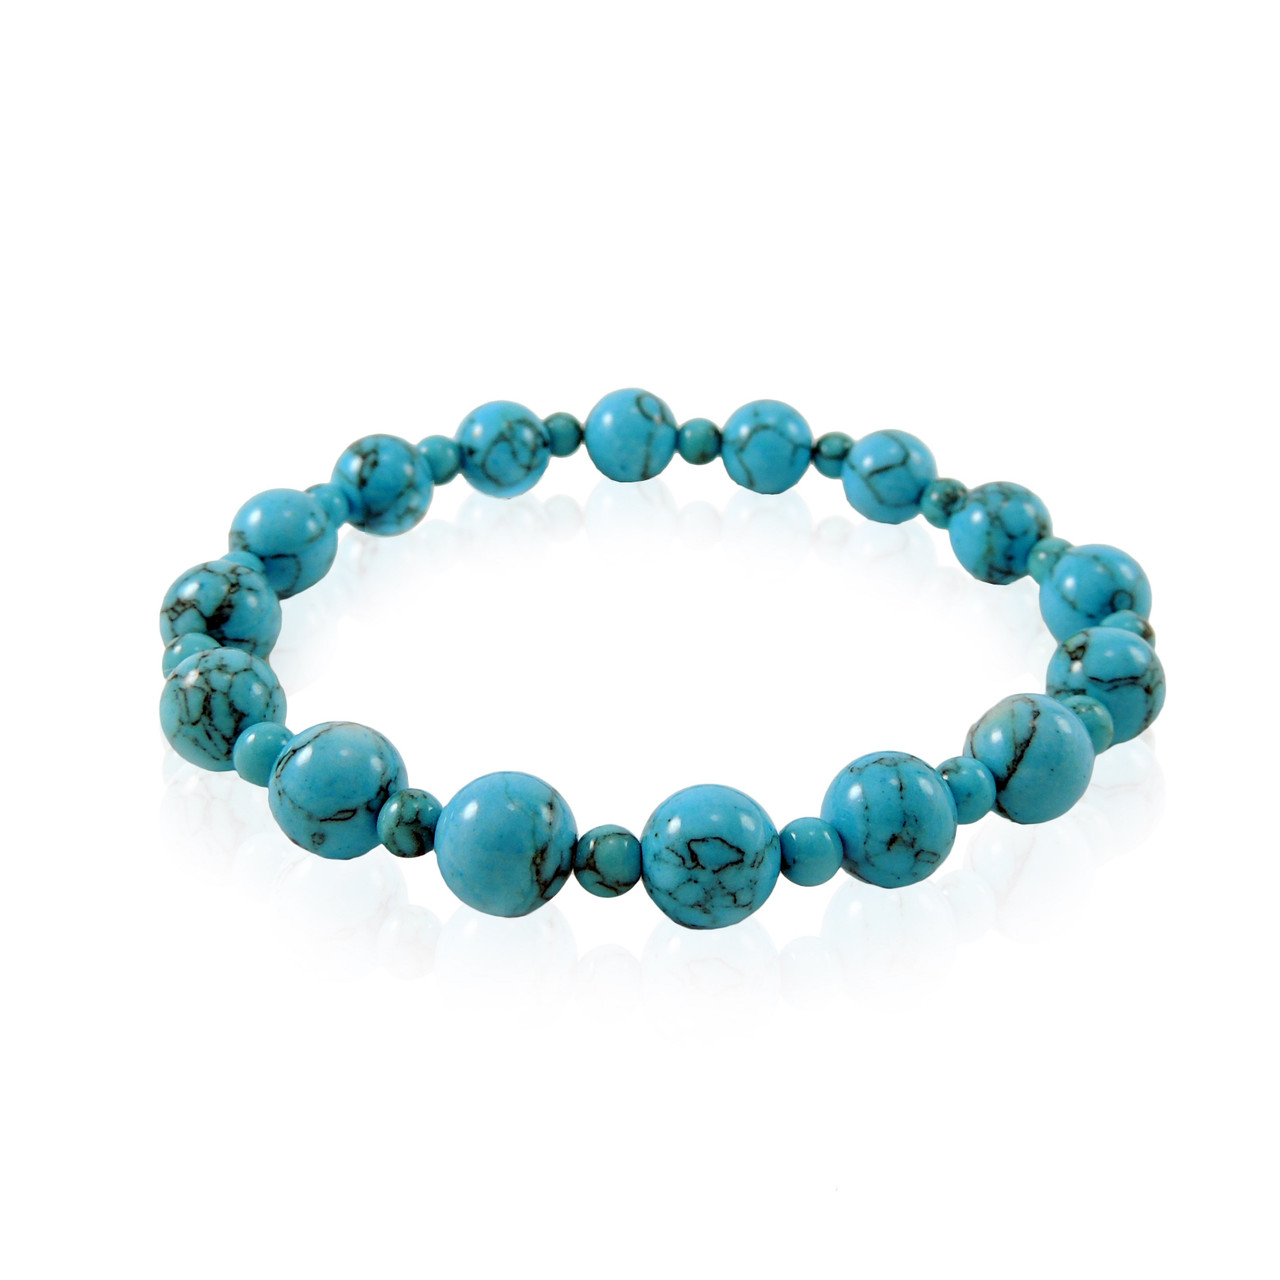 GBTQ-KGB9tq Turquoise Howlite Bracelet